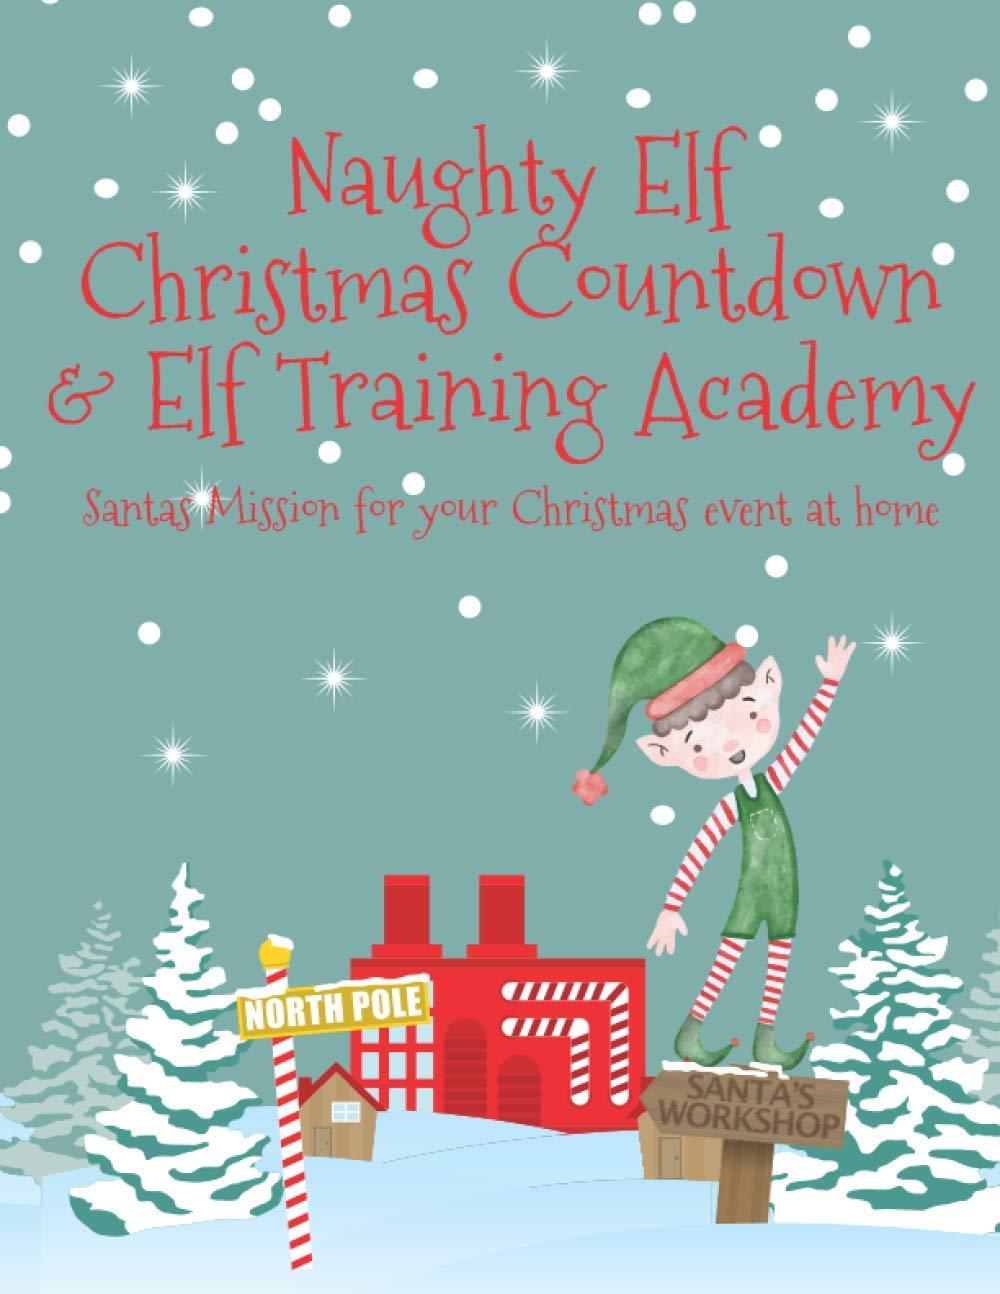 Elf Christmas Countdown 2020 Naughty Elf Christmas Countdown & Elf Training Academy | Santas